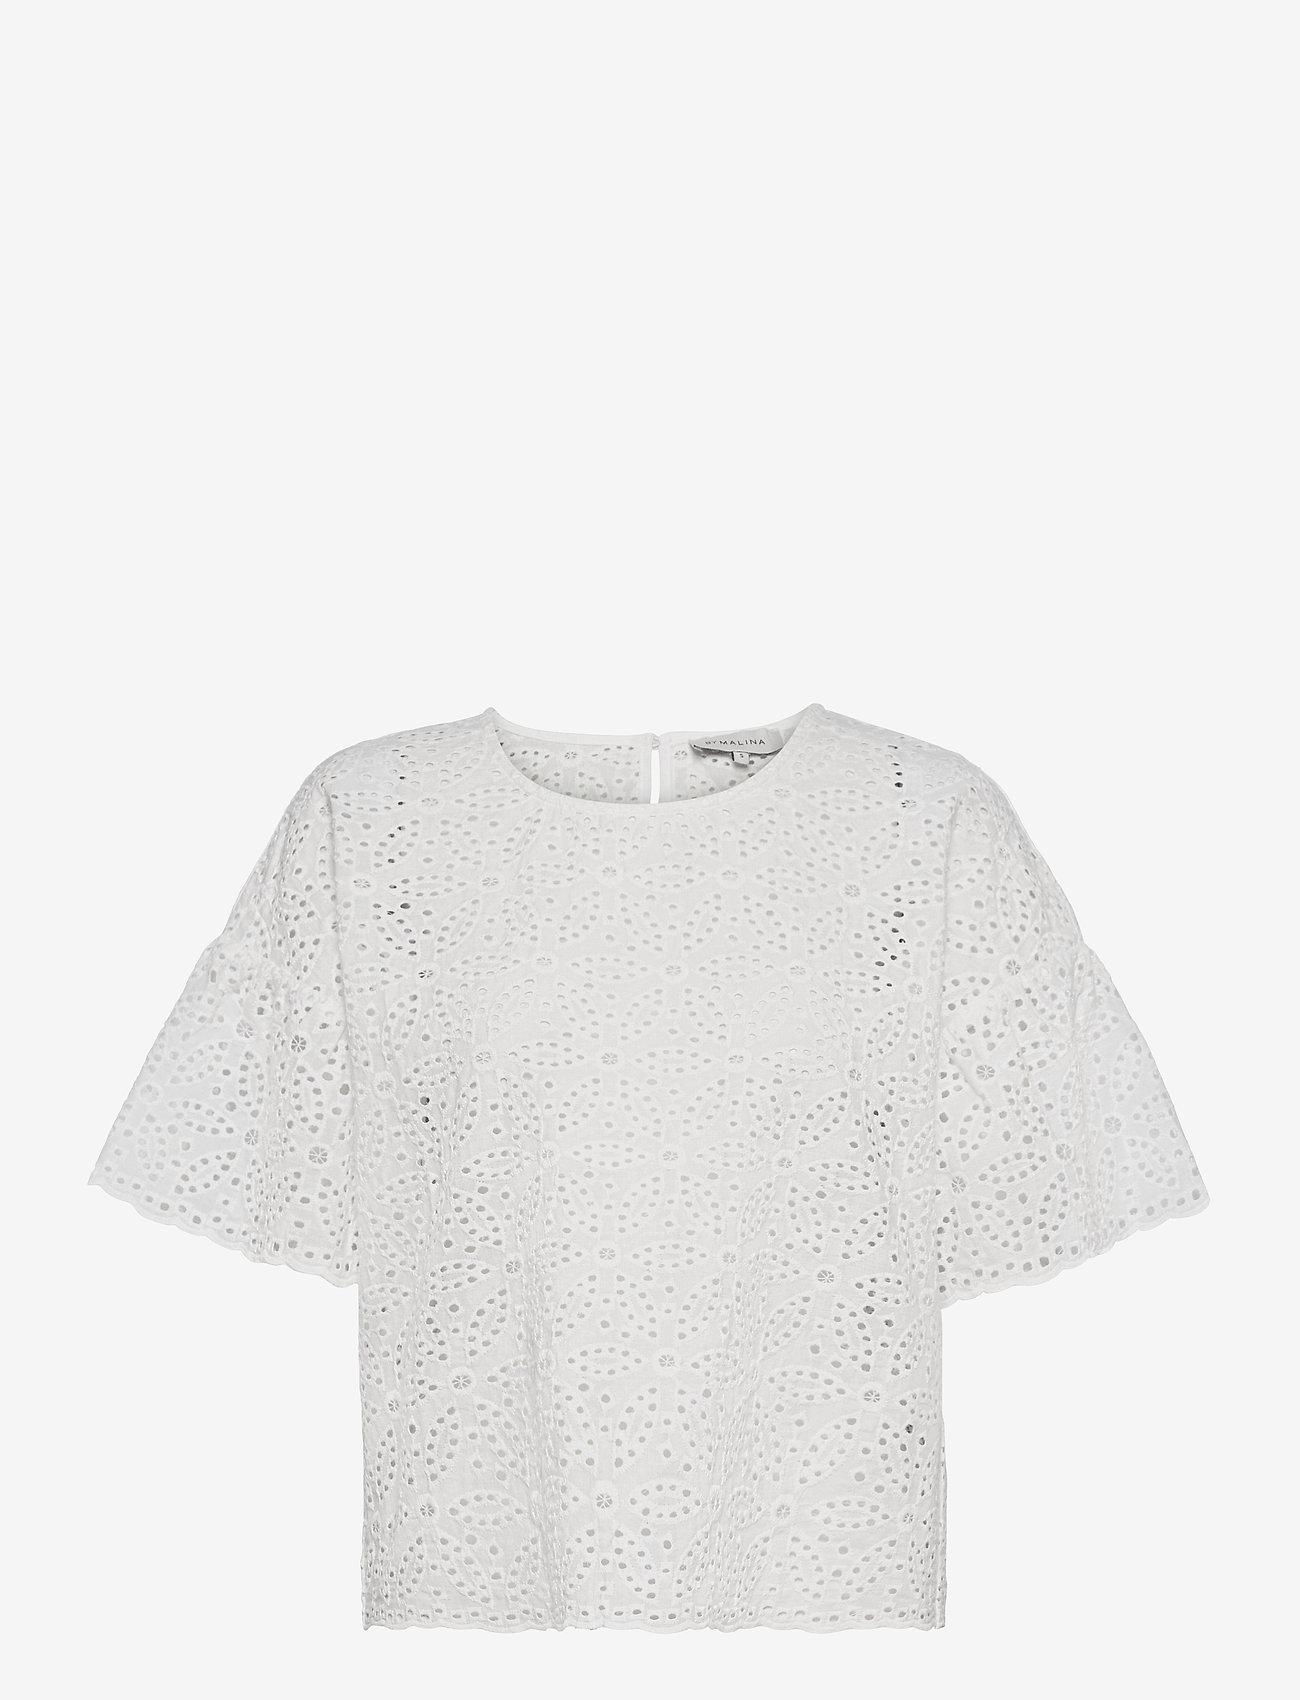 By Malina - Callie blouse - kortärmade blusar - white - 1